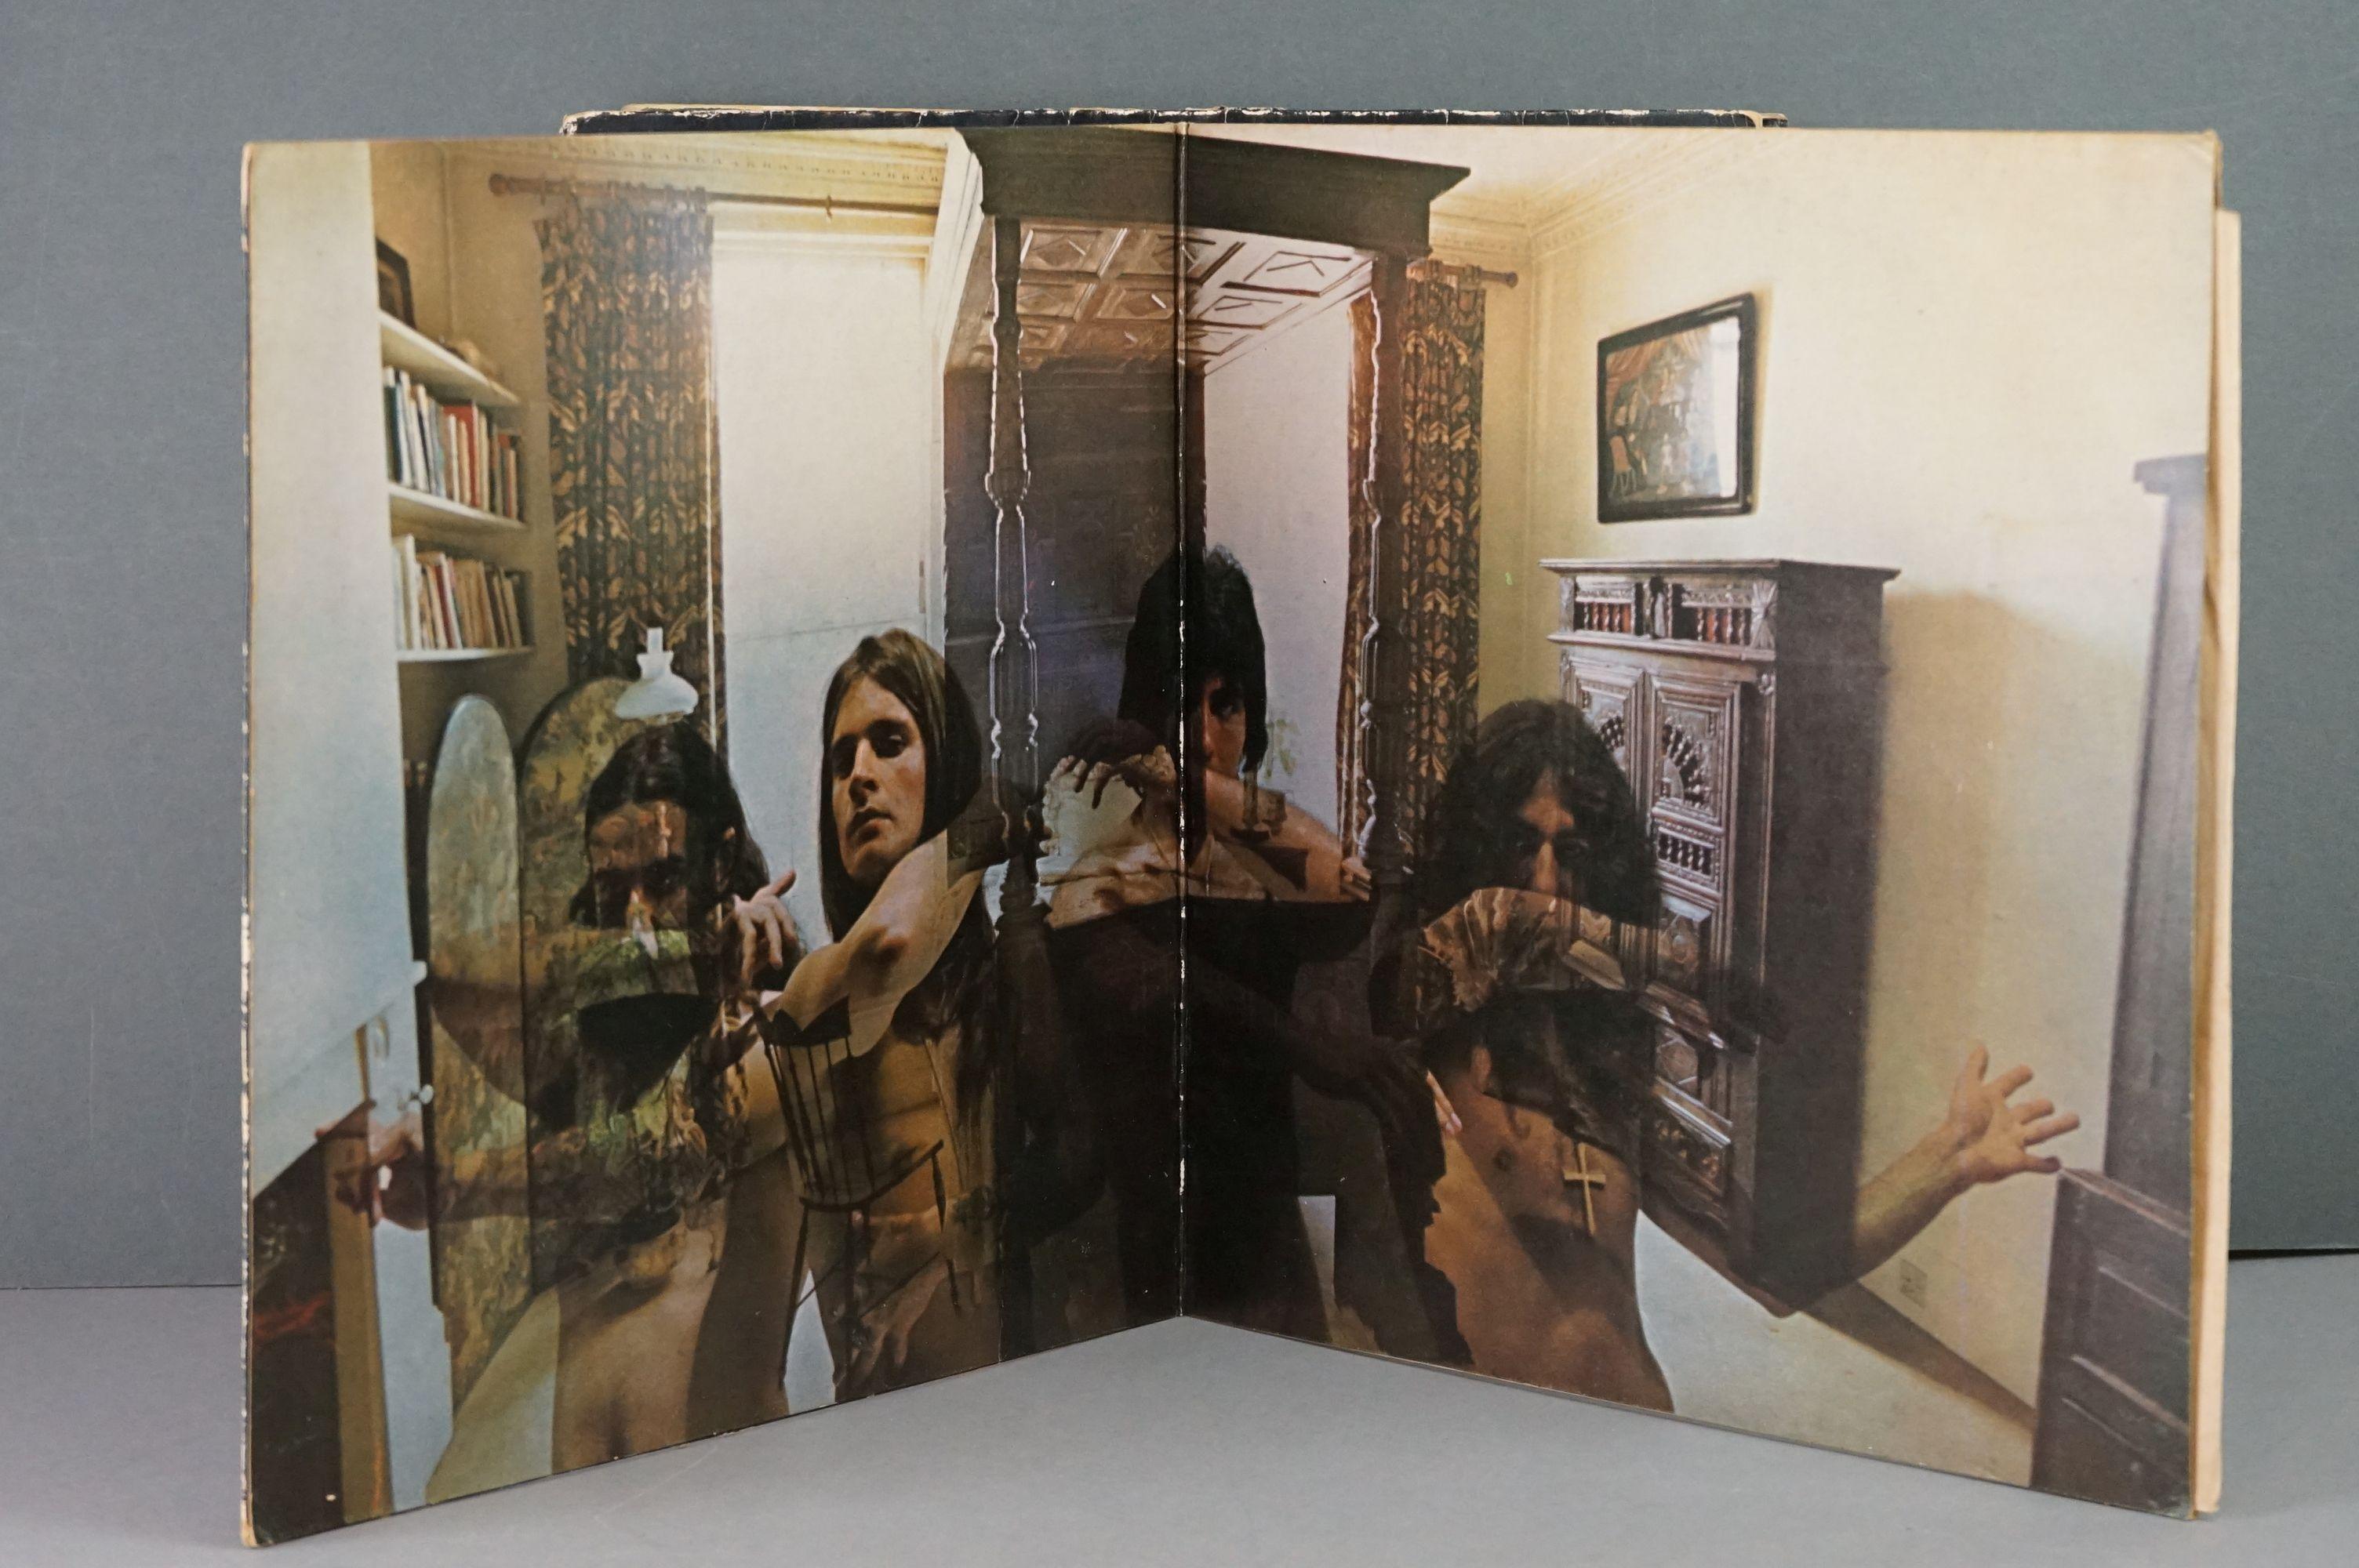 Vinyl - Twelve Black Sabbath vinyl LP's to include Technical Ecstasy (Vertigo Records PRICE 40), - Image 11 of 17